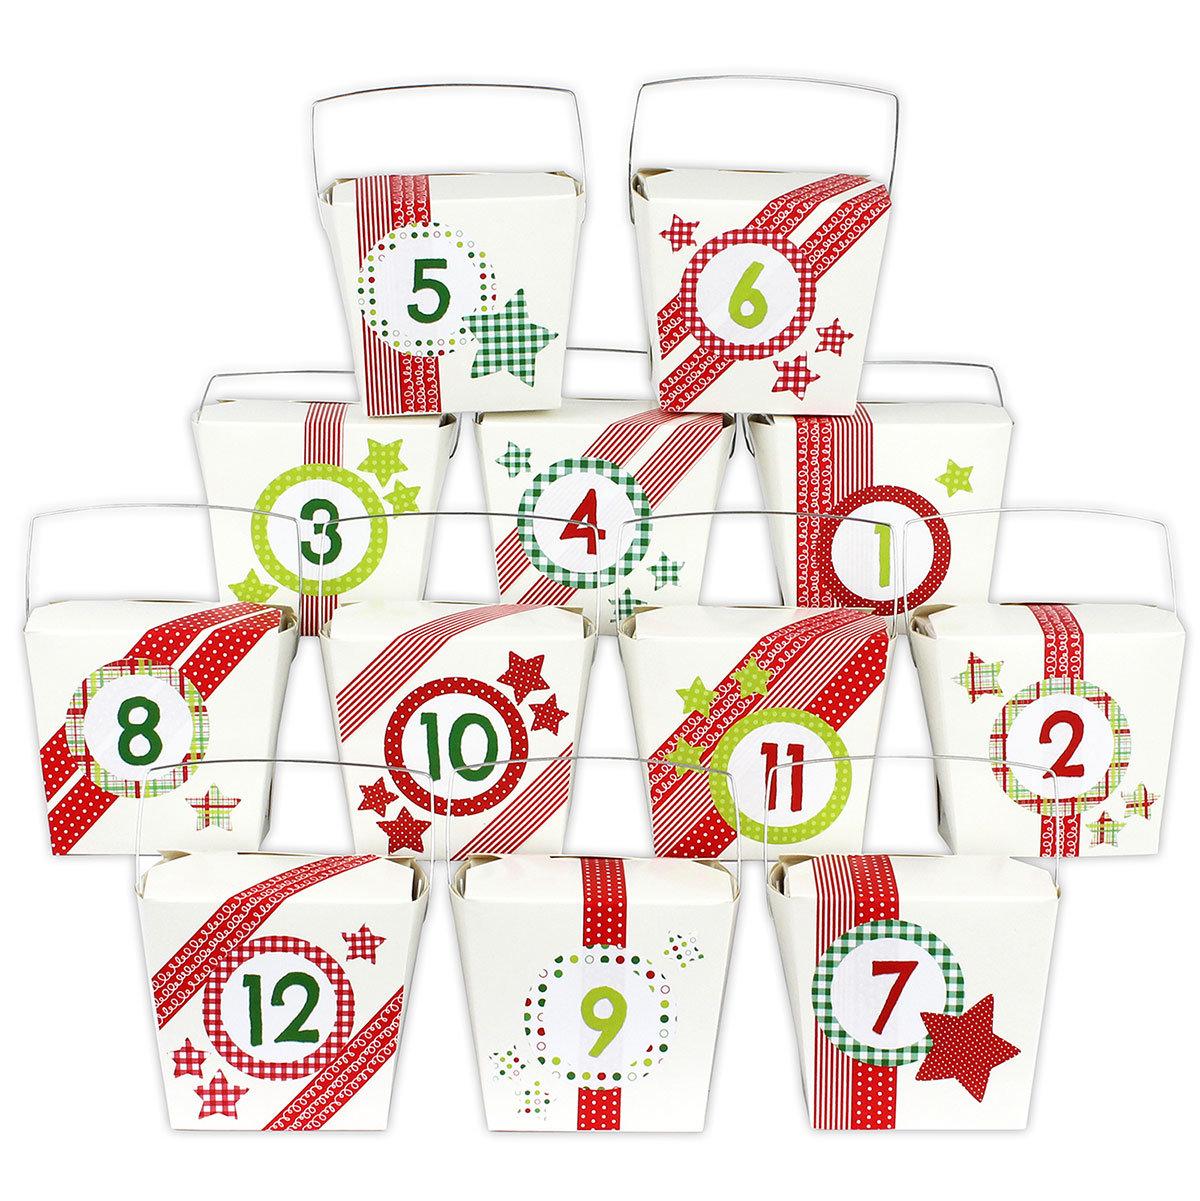 diy adventskalender set 24 asia boxen mit rotem washi tape und 24 aufklebern zum selber. Black Bedroom Furniture Sets. Home Design Ideas